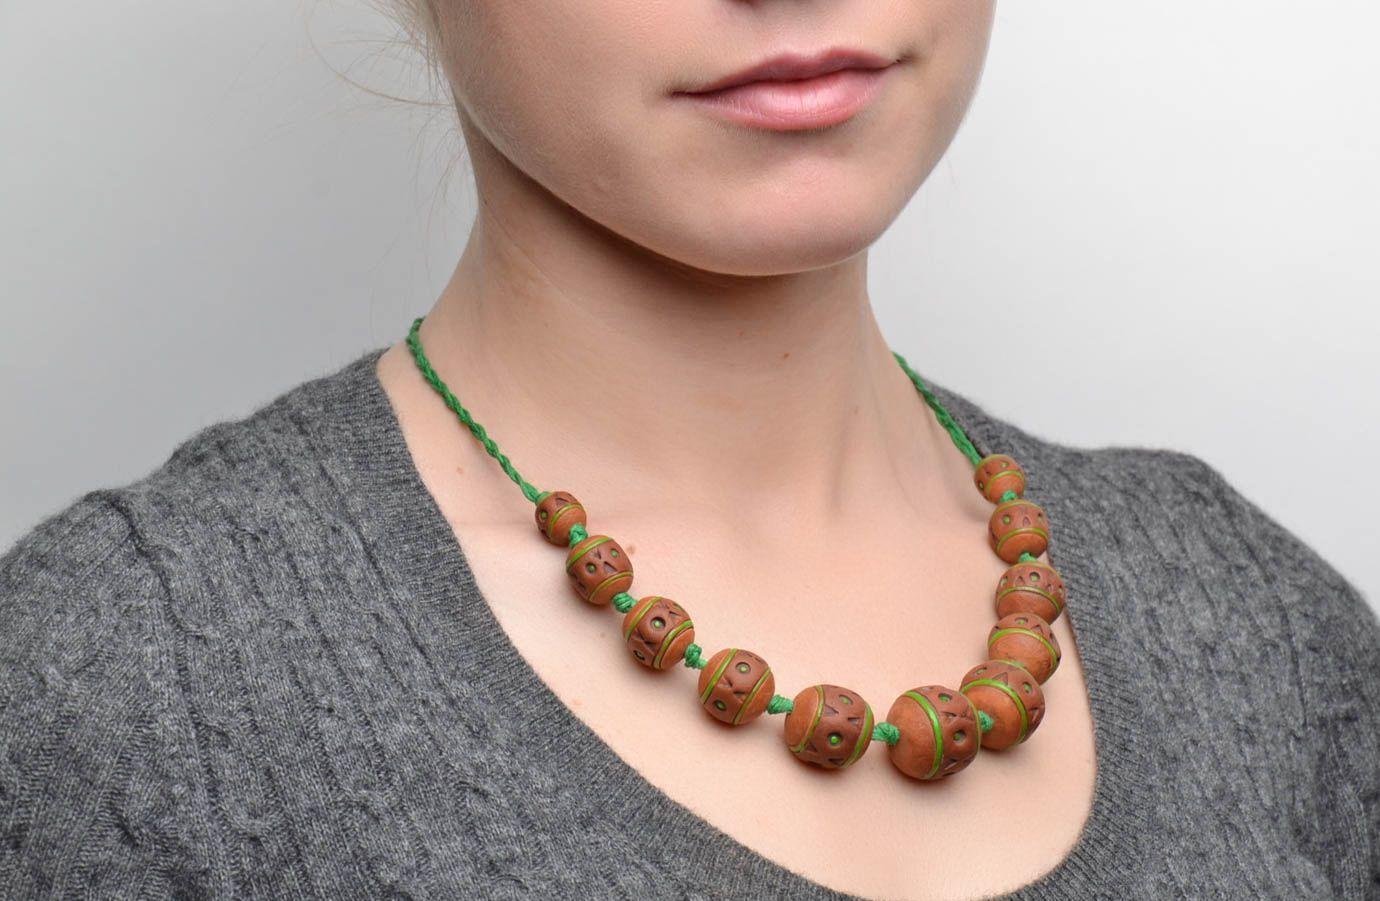 Broe=wn ceramic bead necklace photo 2